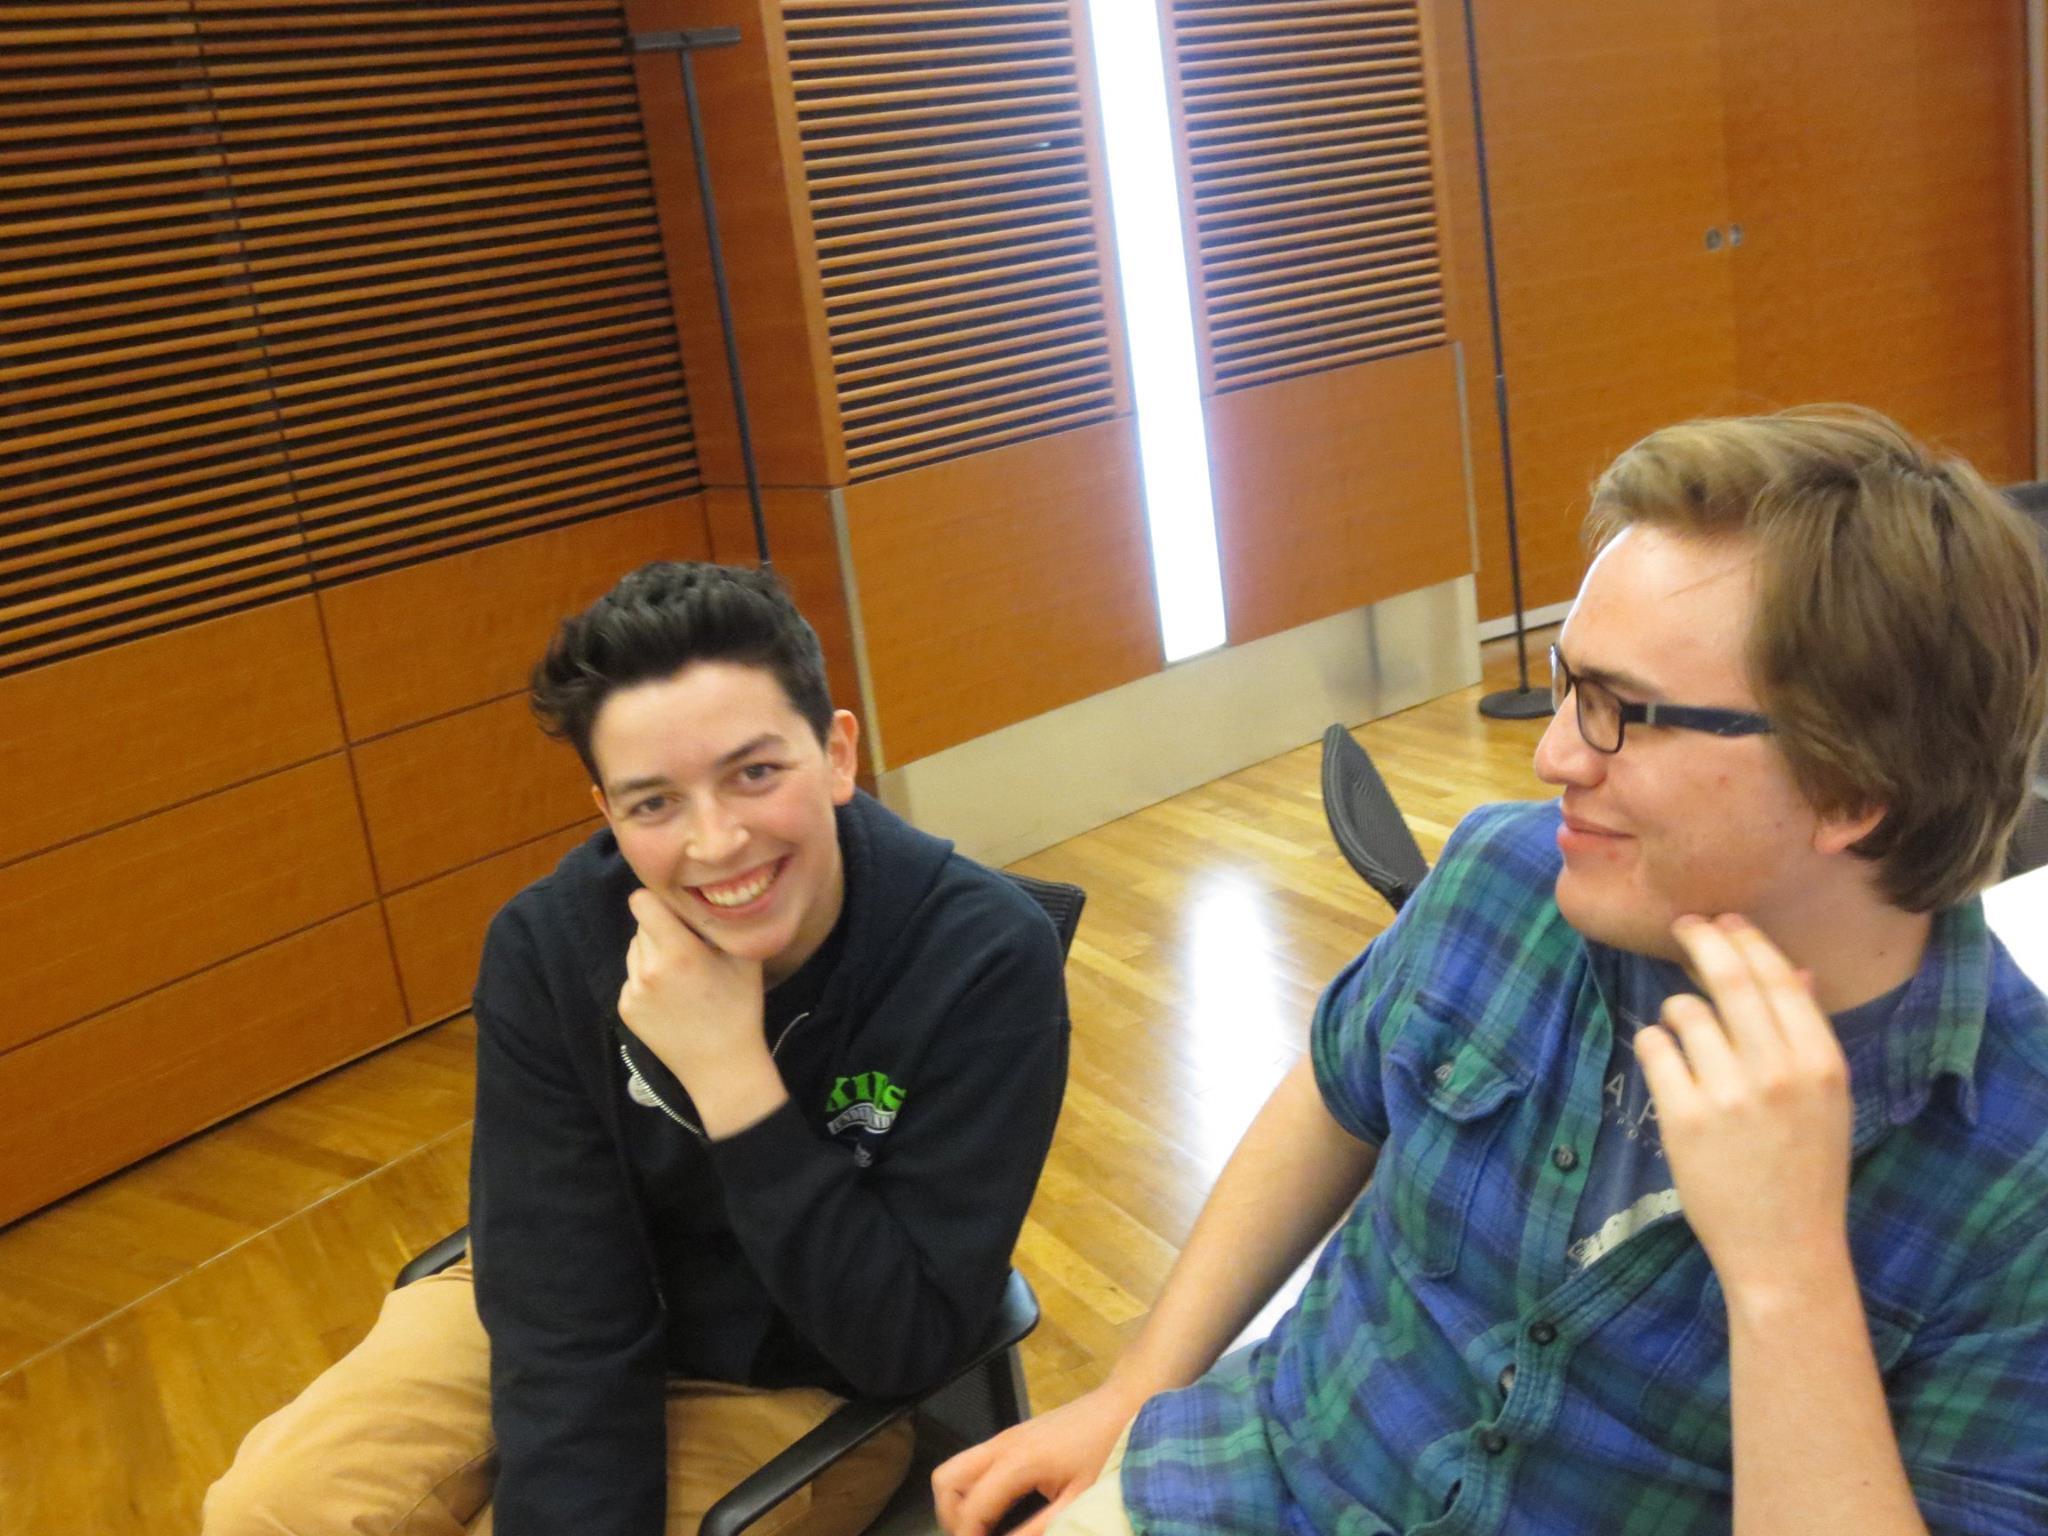 Ezra and Nathan smiling